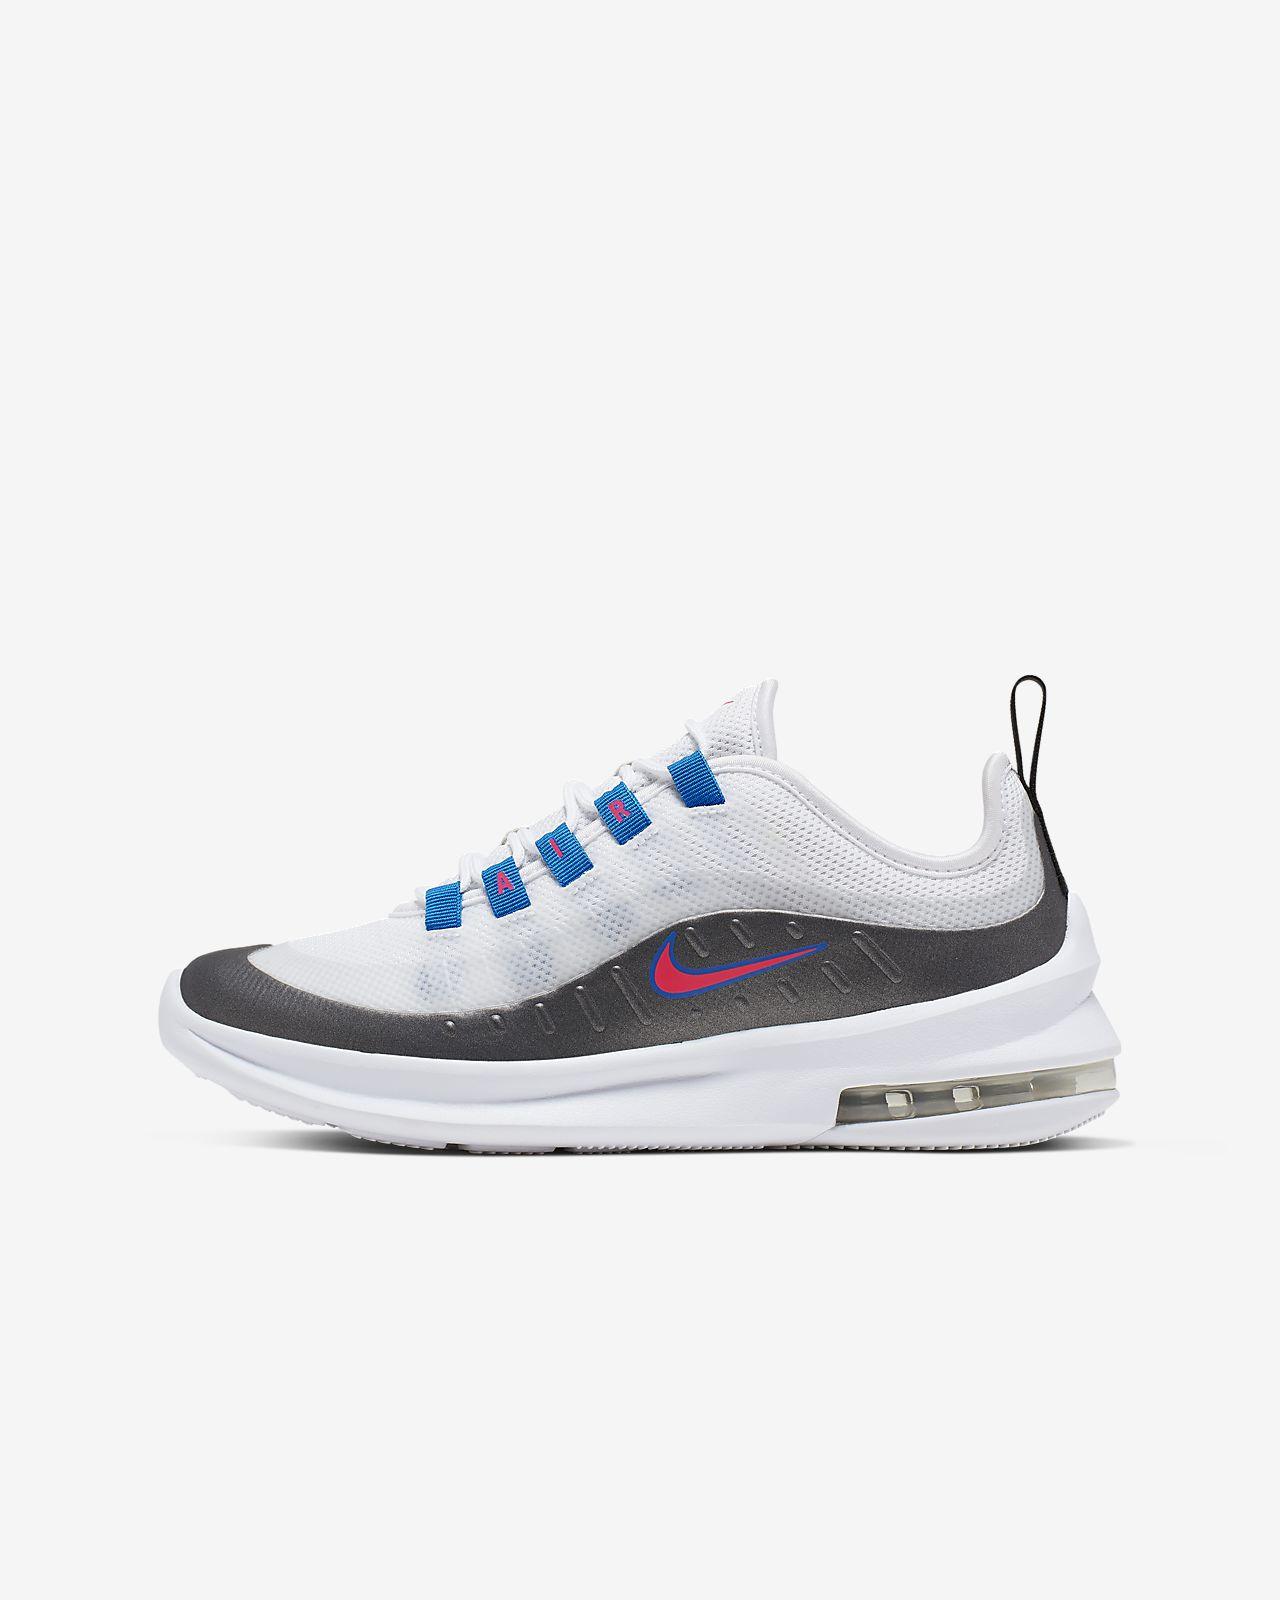 Nike Air Max Axis cipő nagyobb gyerekeknek